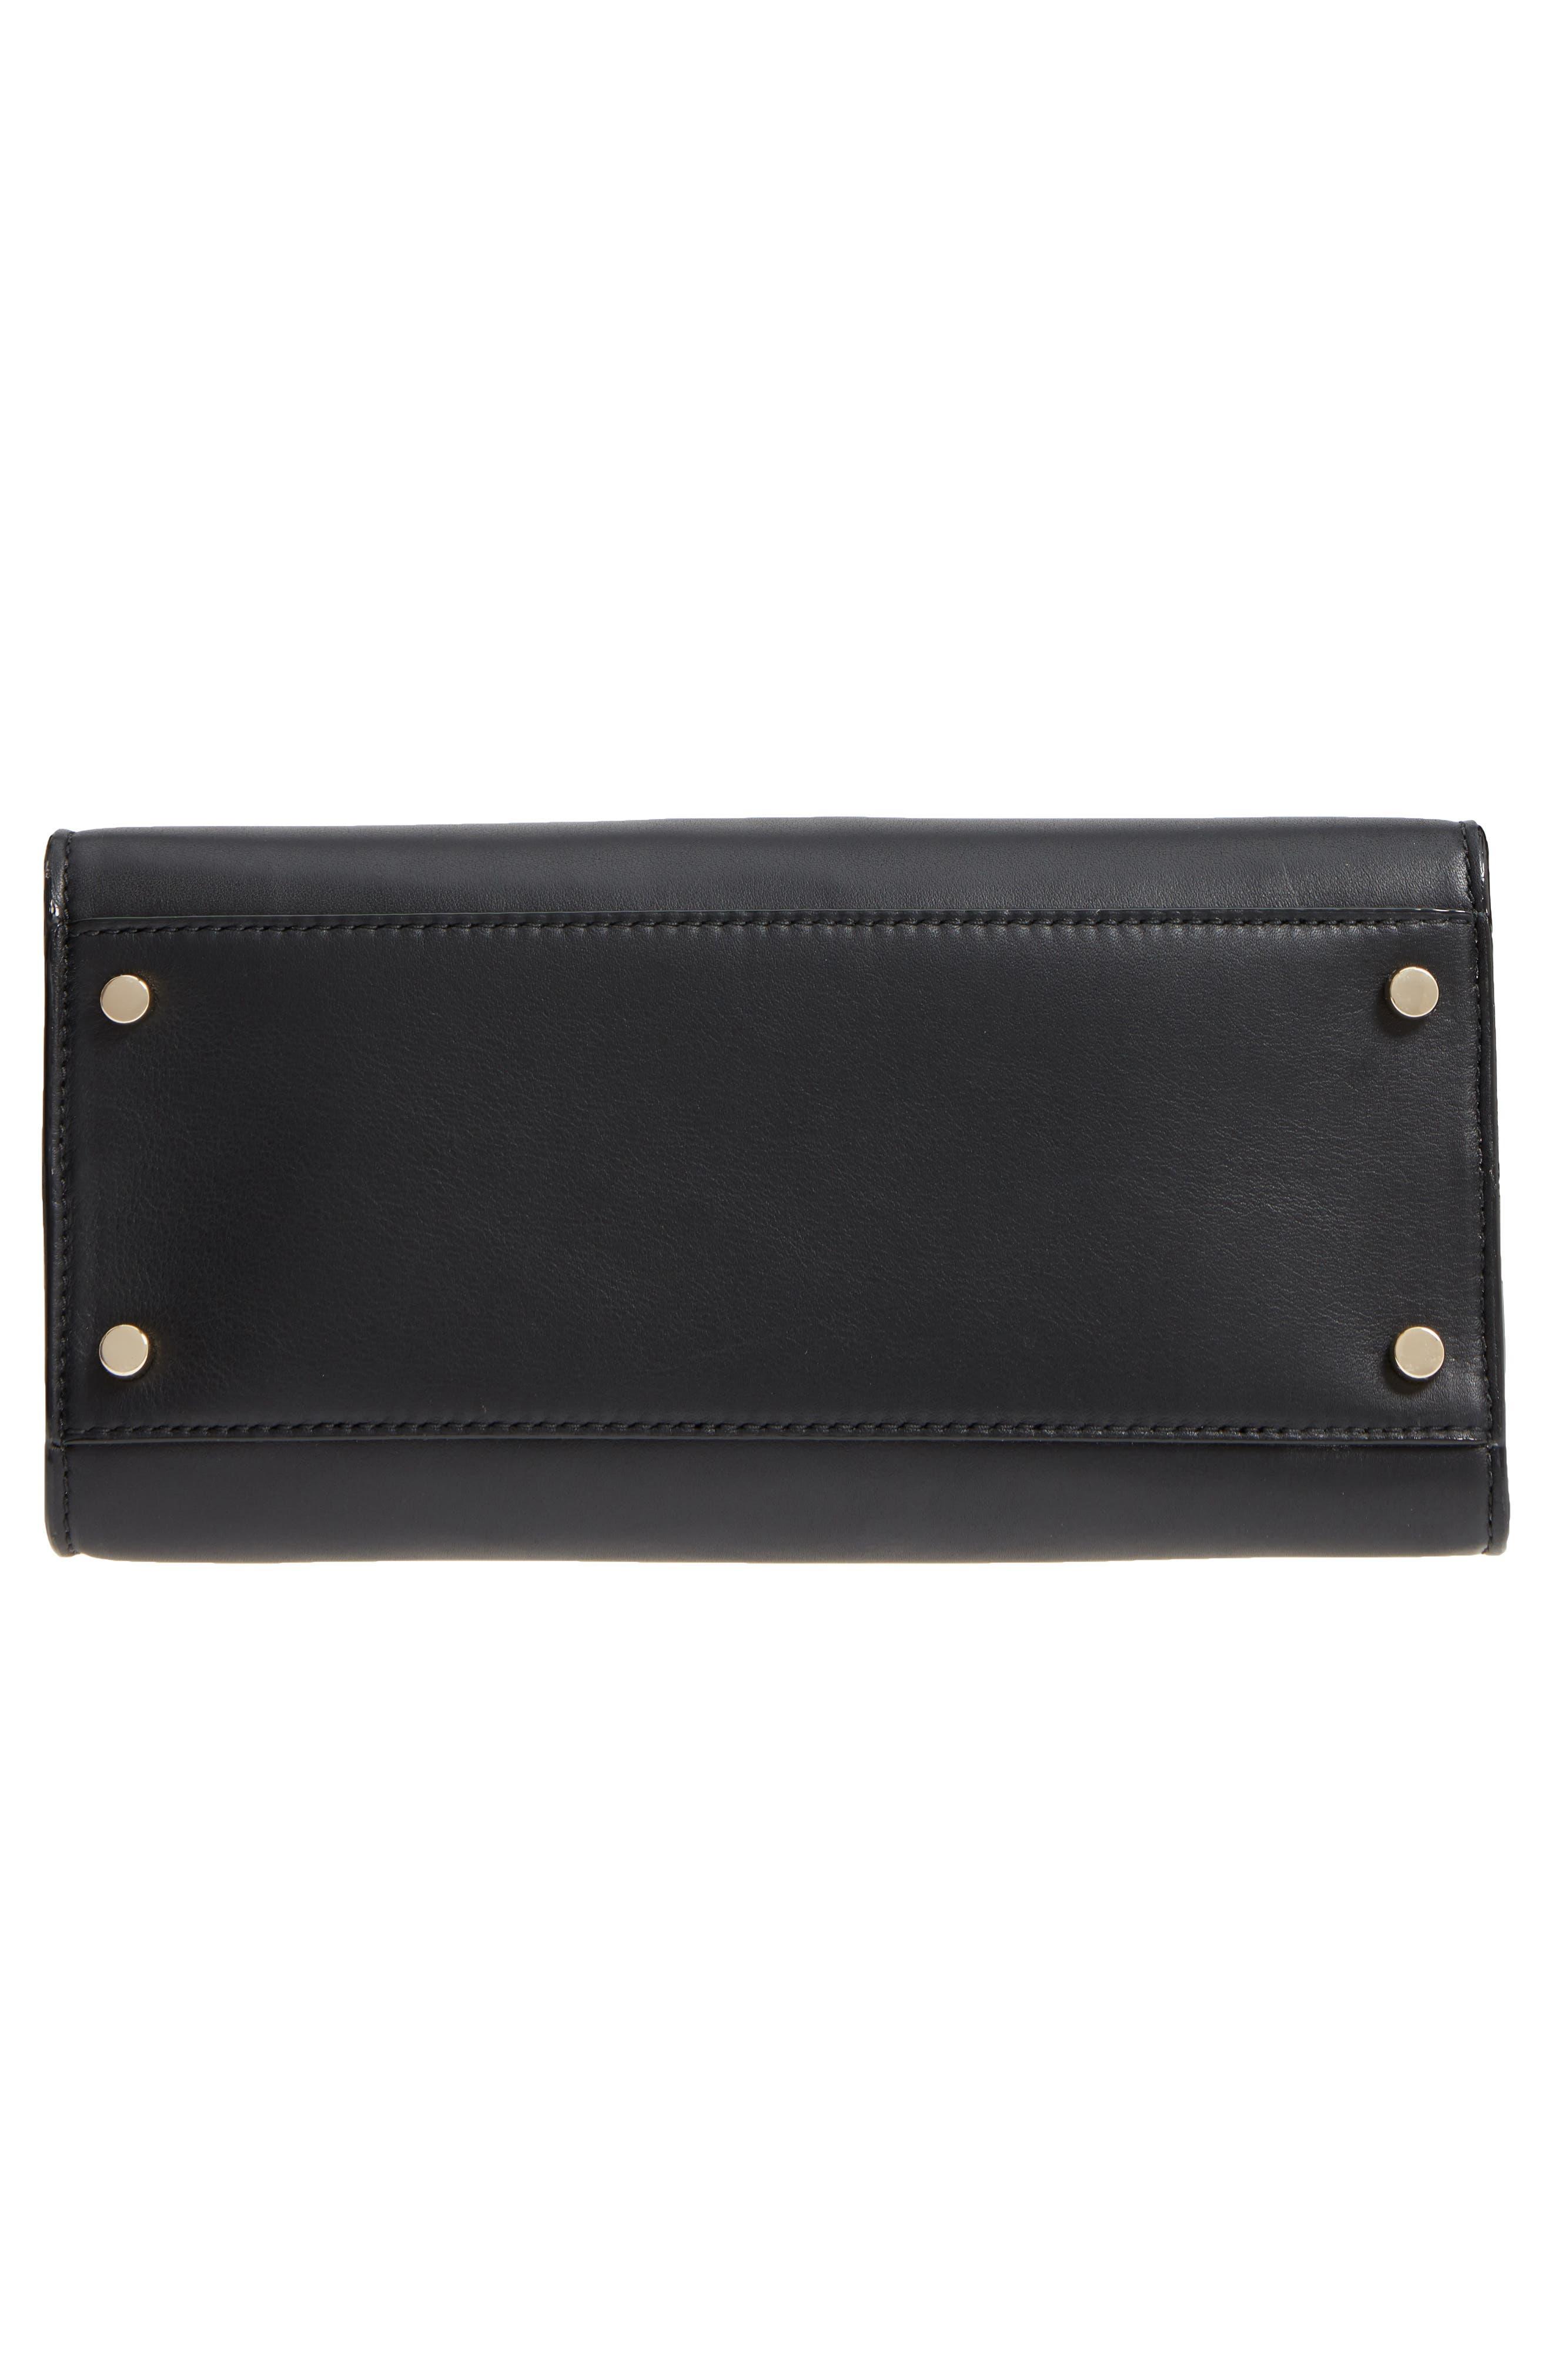 KATE SPADE NEW YORK,                             white rock road - sam leather satchel,                             Alternate thumbnail 6, color,                             001